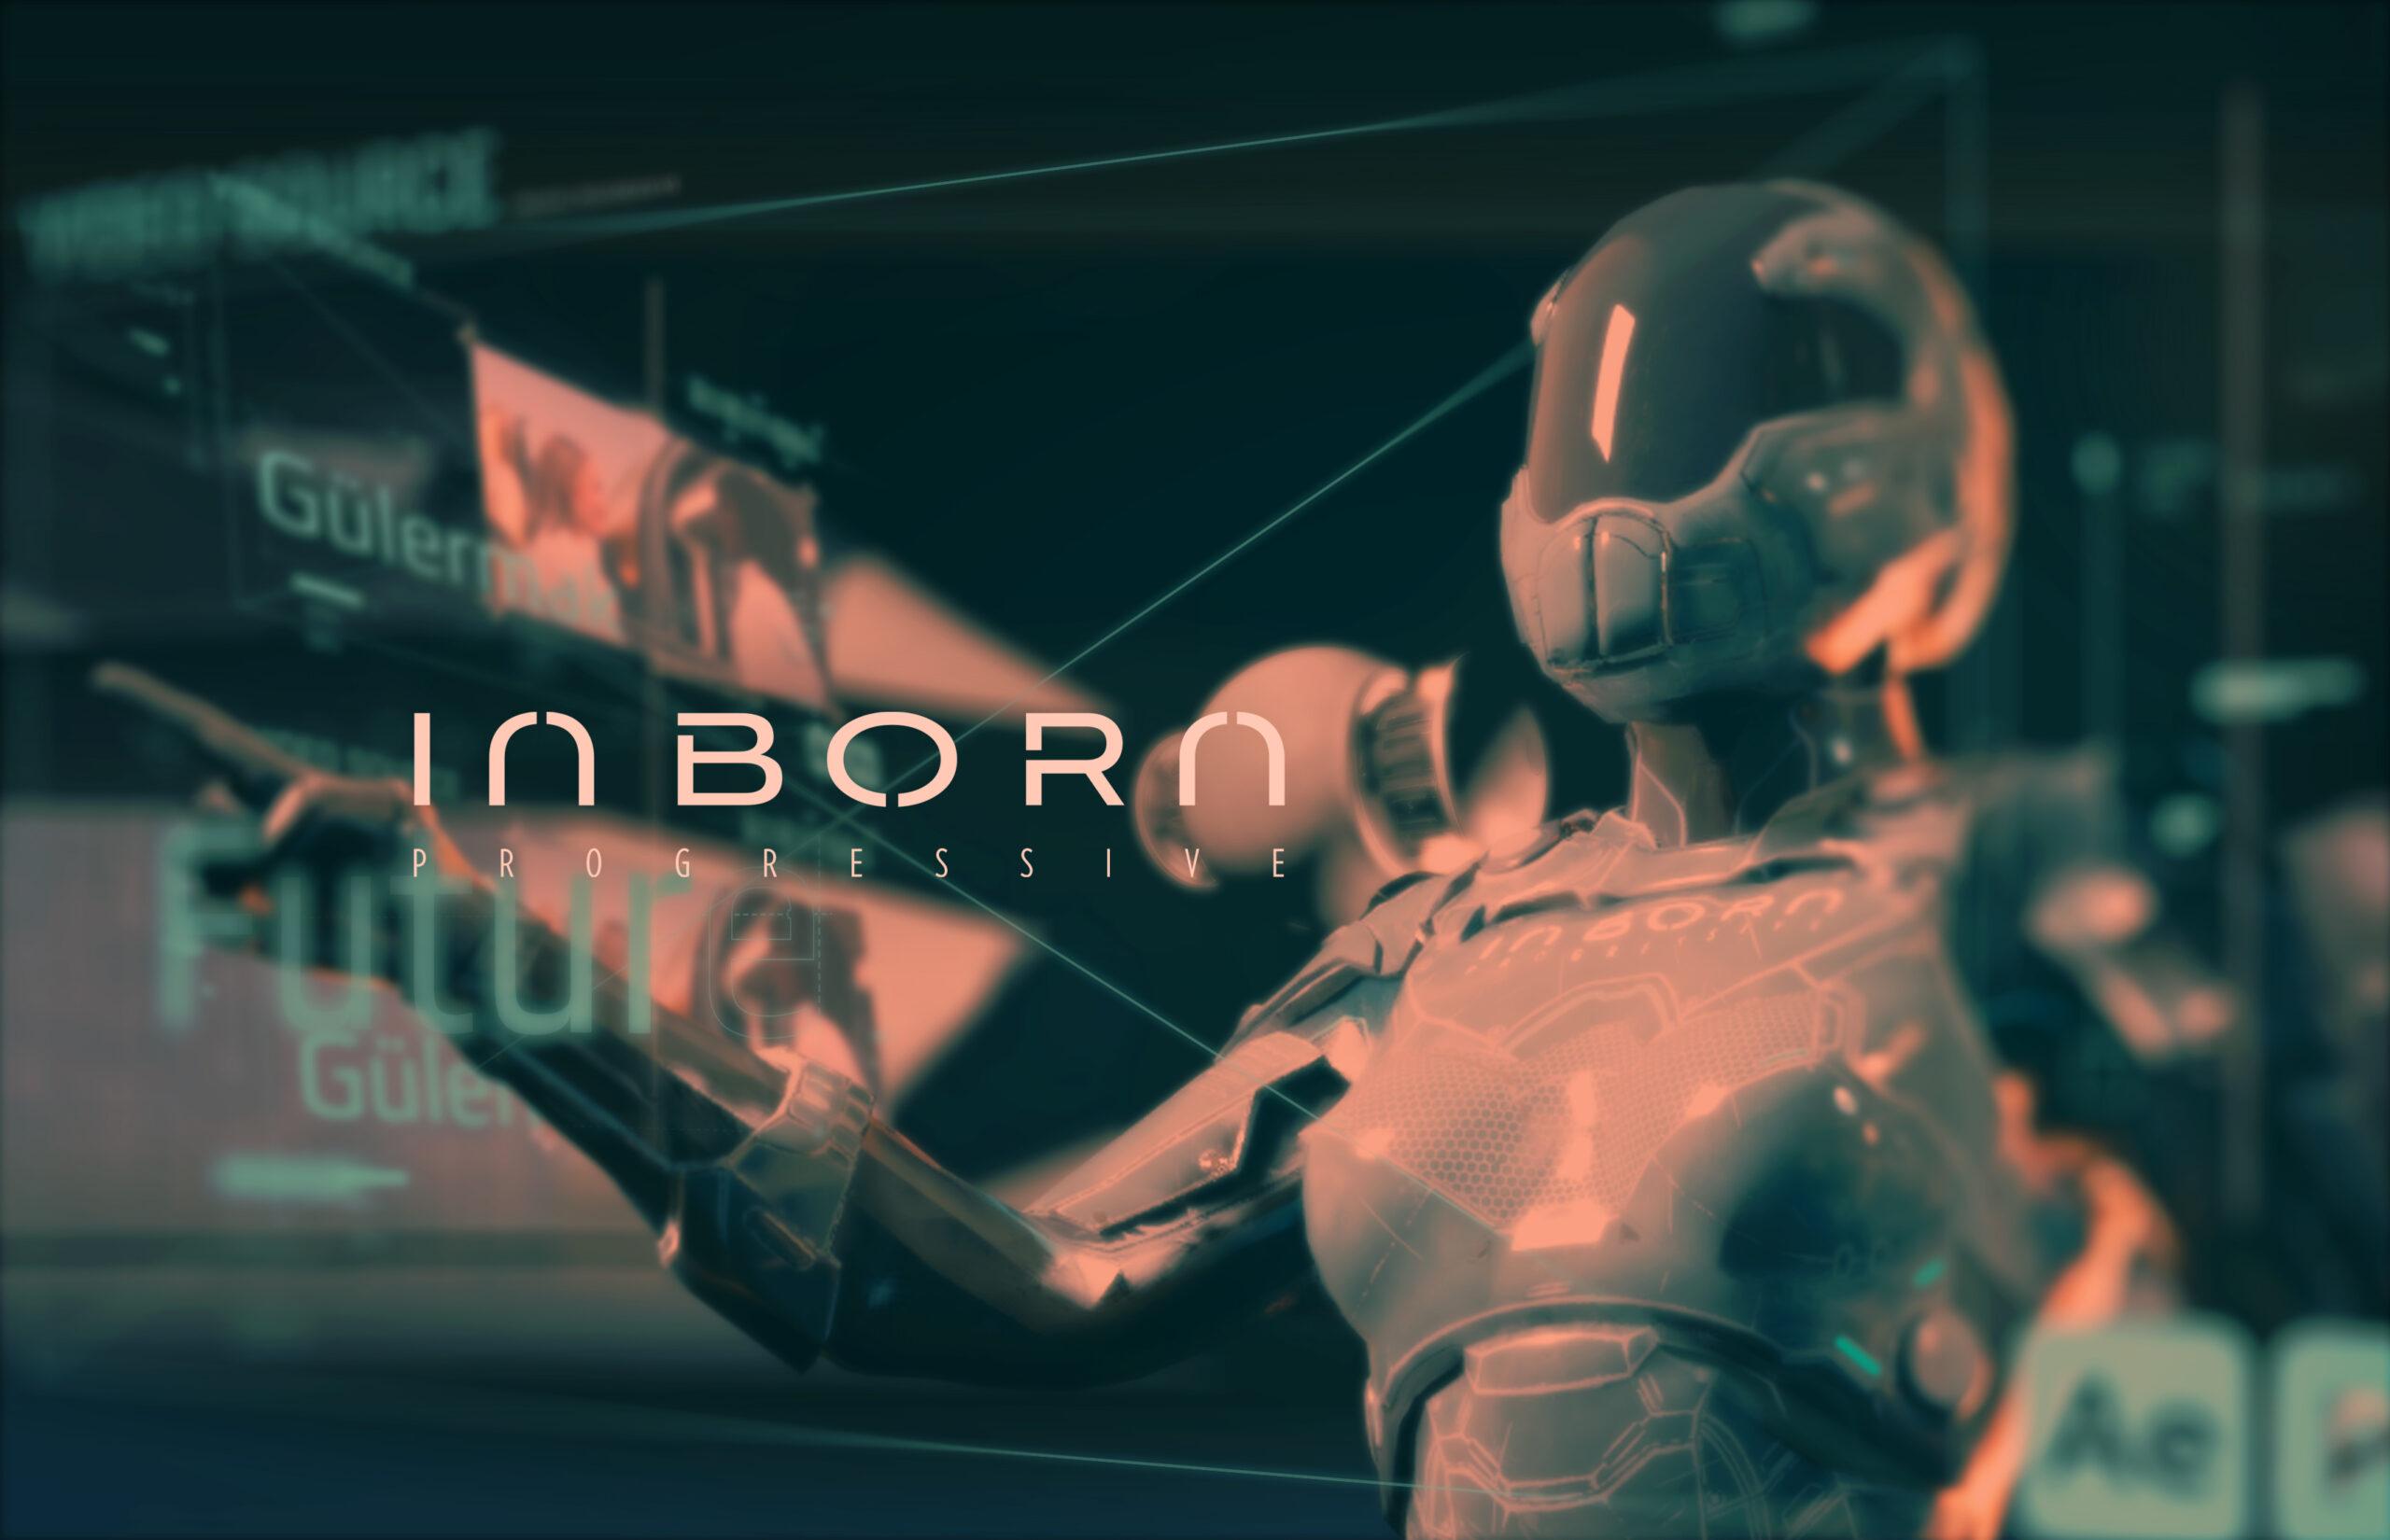 Inborn Progressive